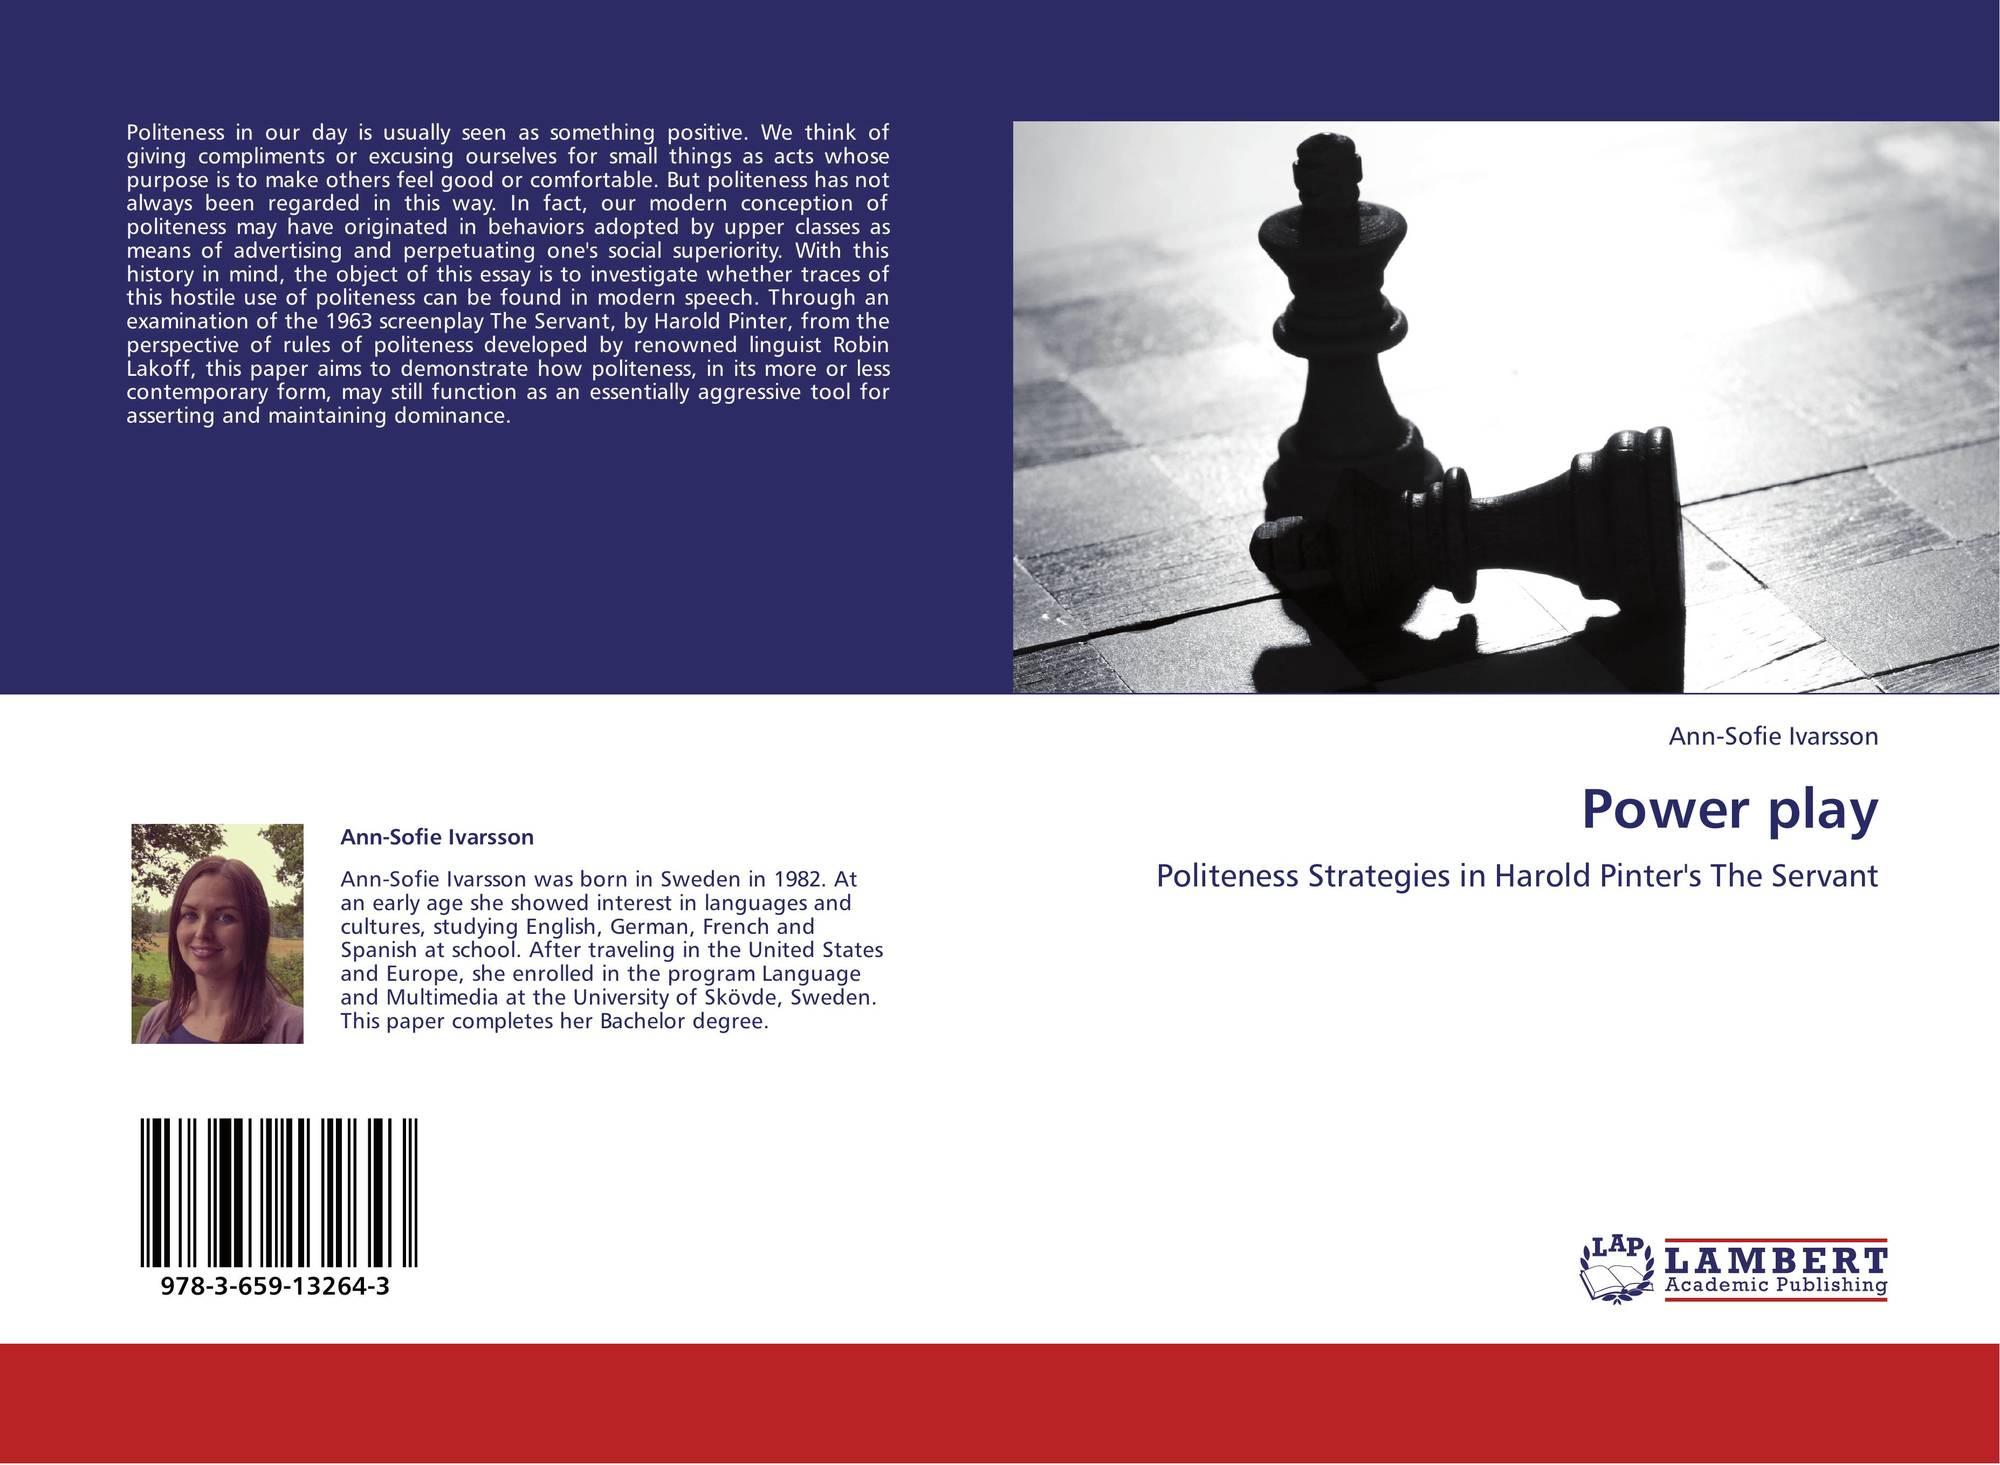 origins of behaviorism essay Methodological behaviorism:  in an essay republished in his 1969 book  mandler described the origins of cognitive psychology in a 2002 article in the.